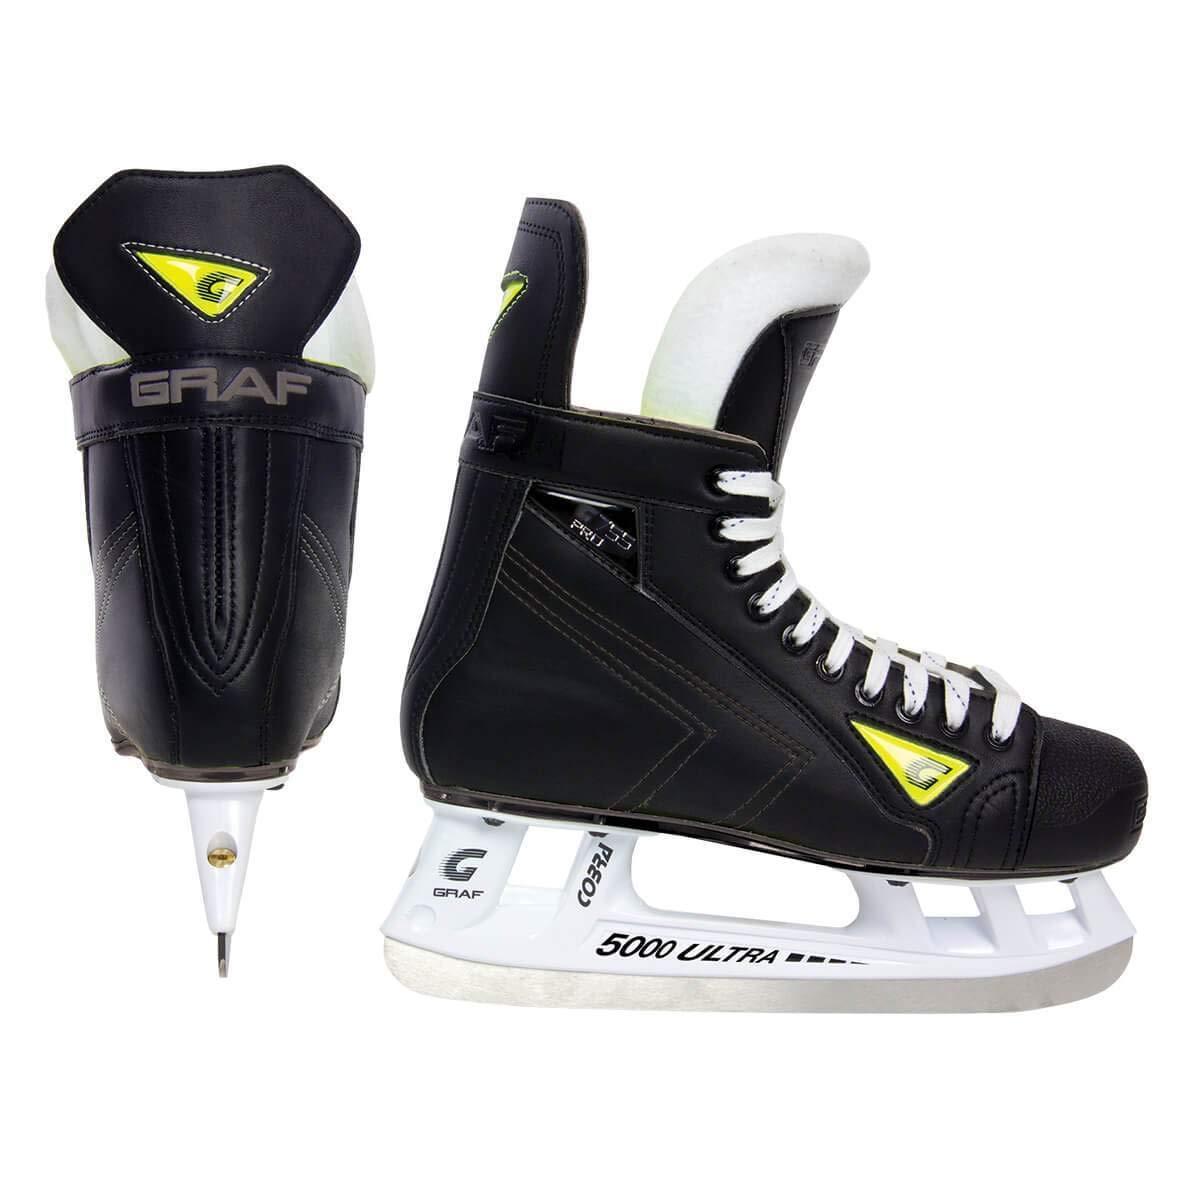 GRAF G755 プロ ホッケー スケート サイズ7.5R